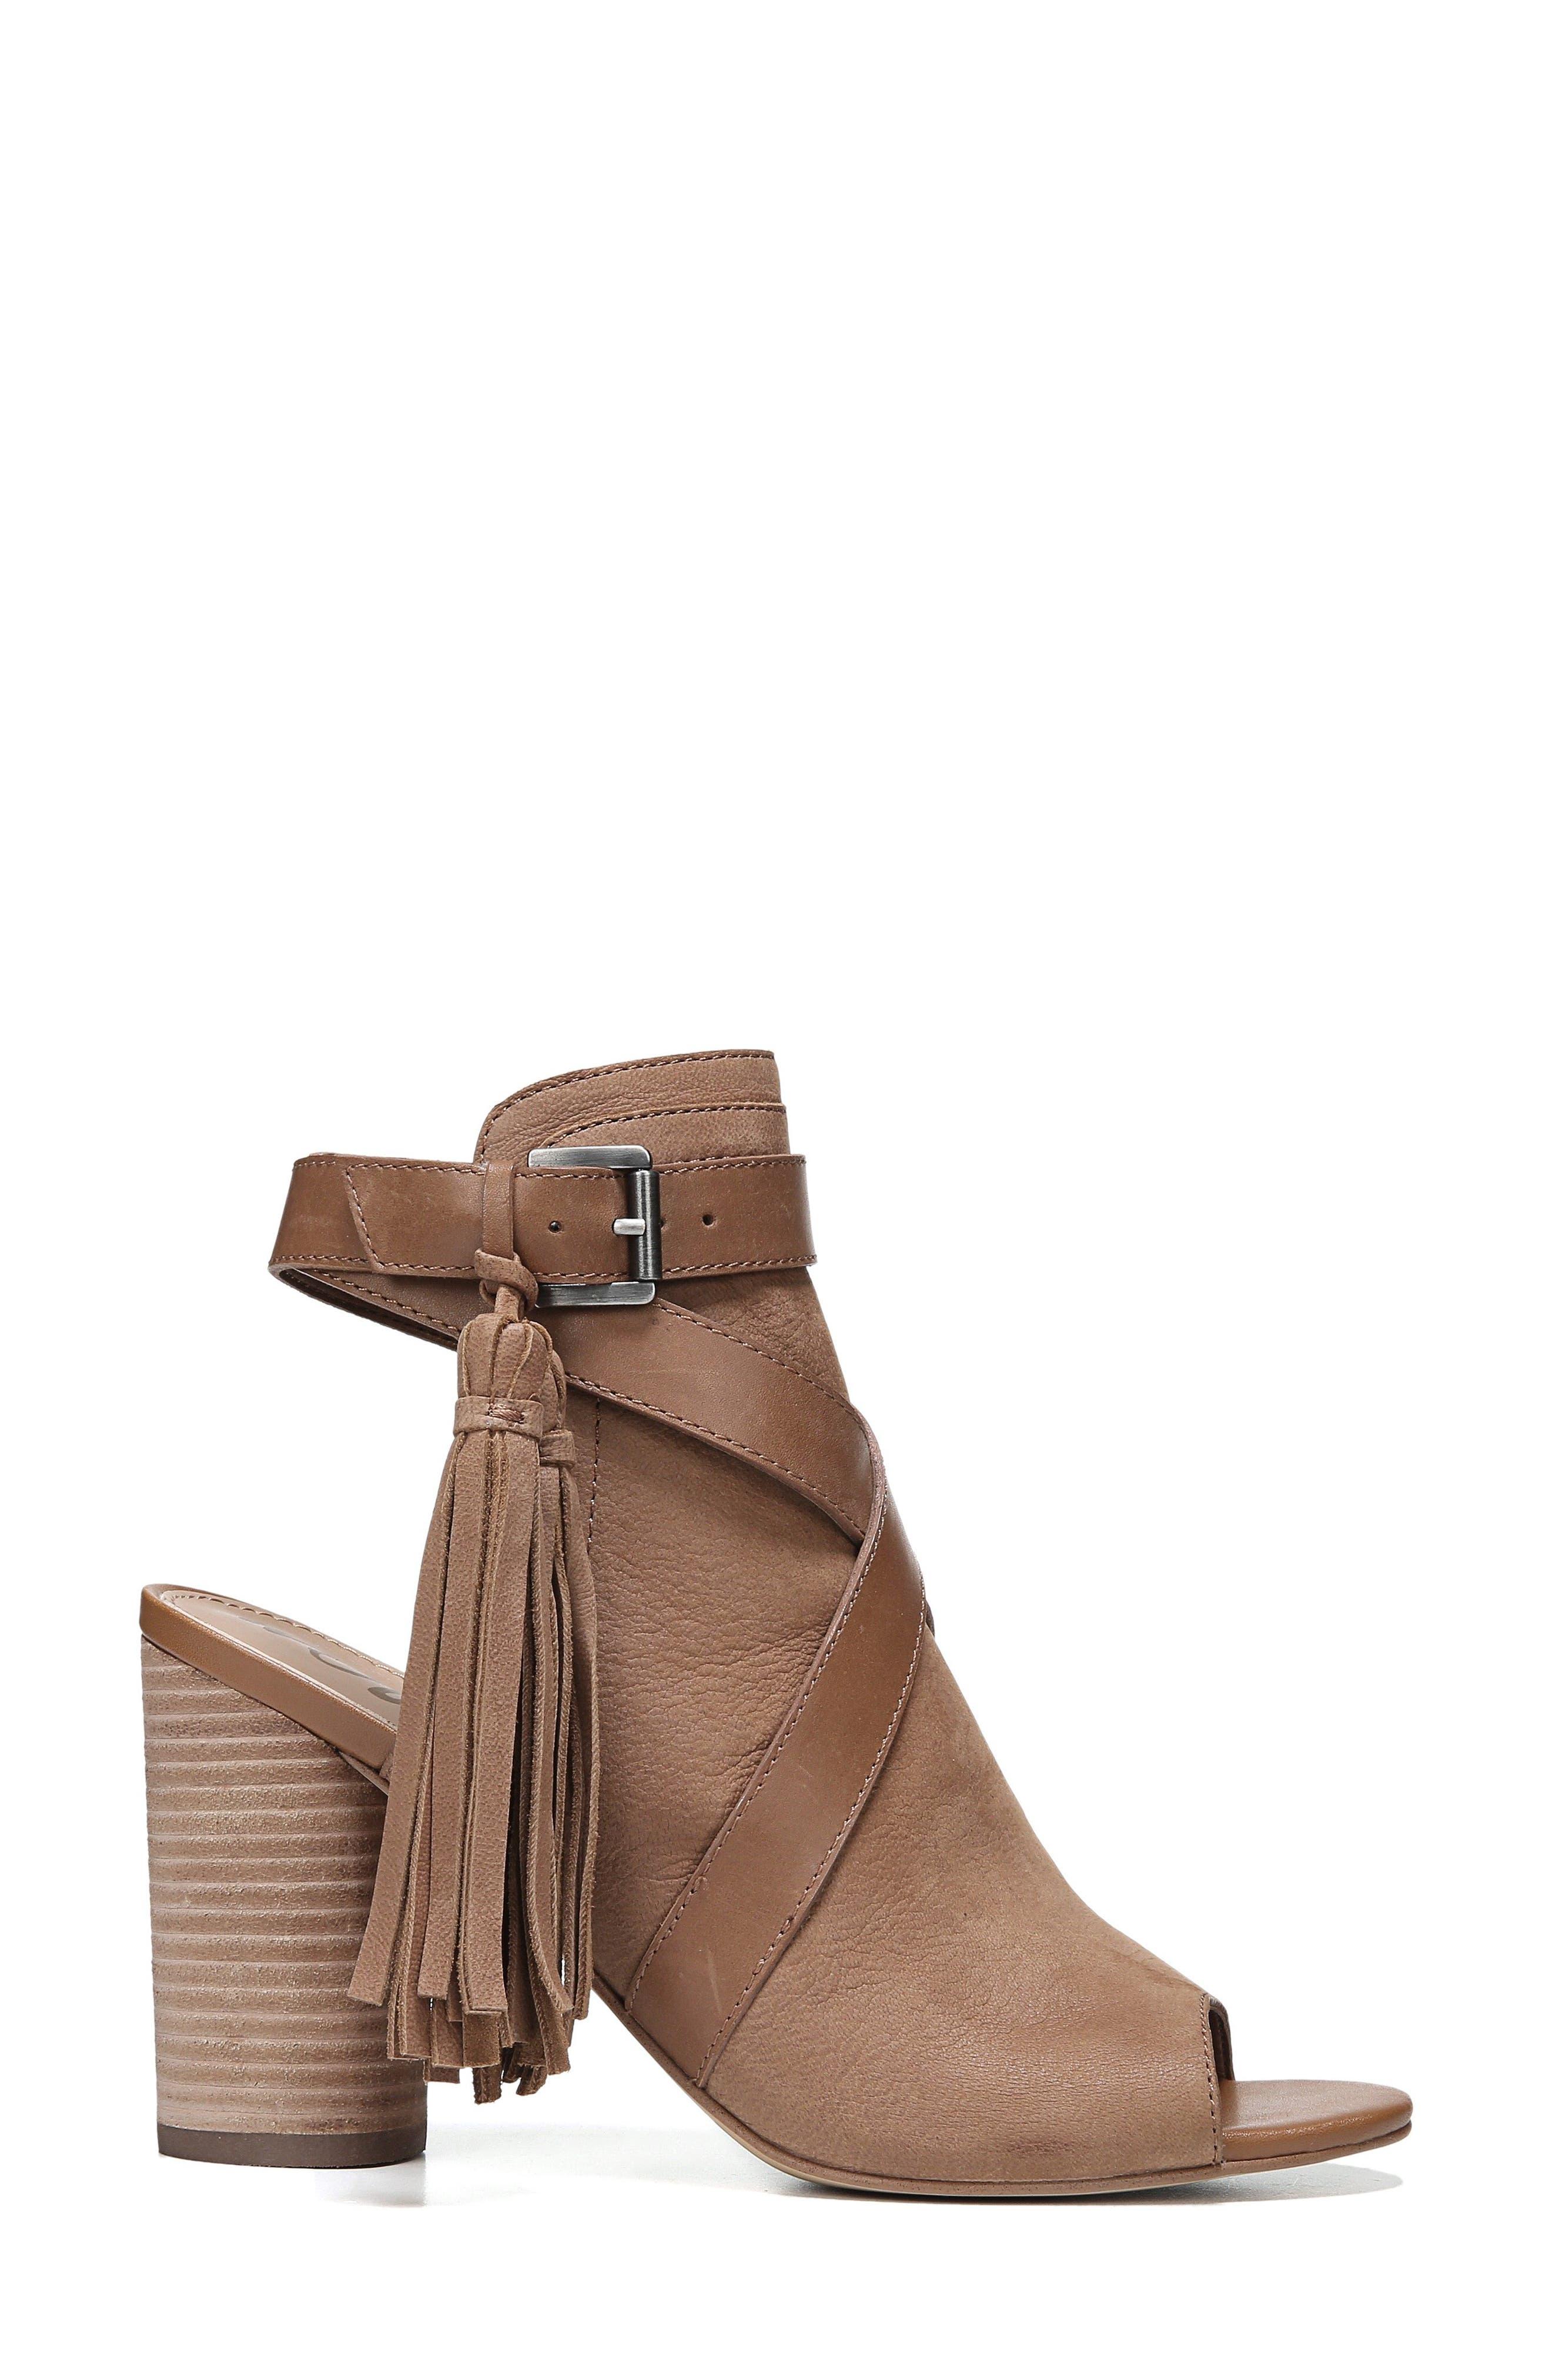 Vermont Block Heel Sandal,                             Alternate thumbnail 3, color,                             Deep Saddle Nubuck Leather